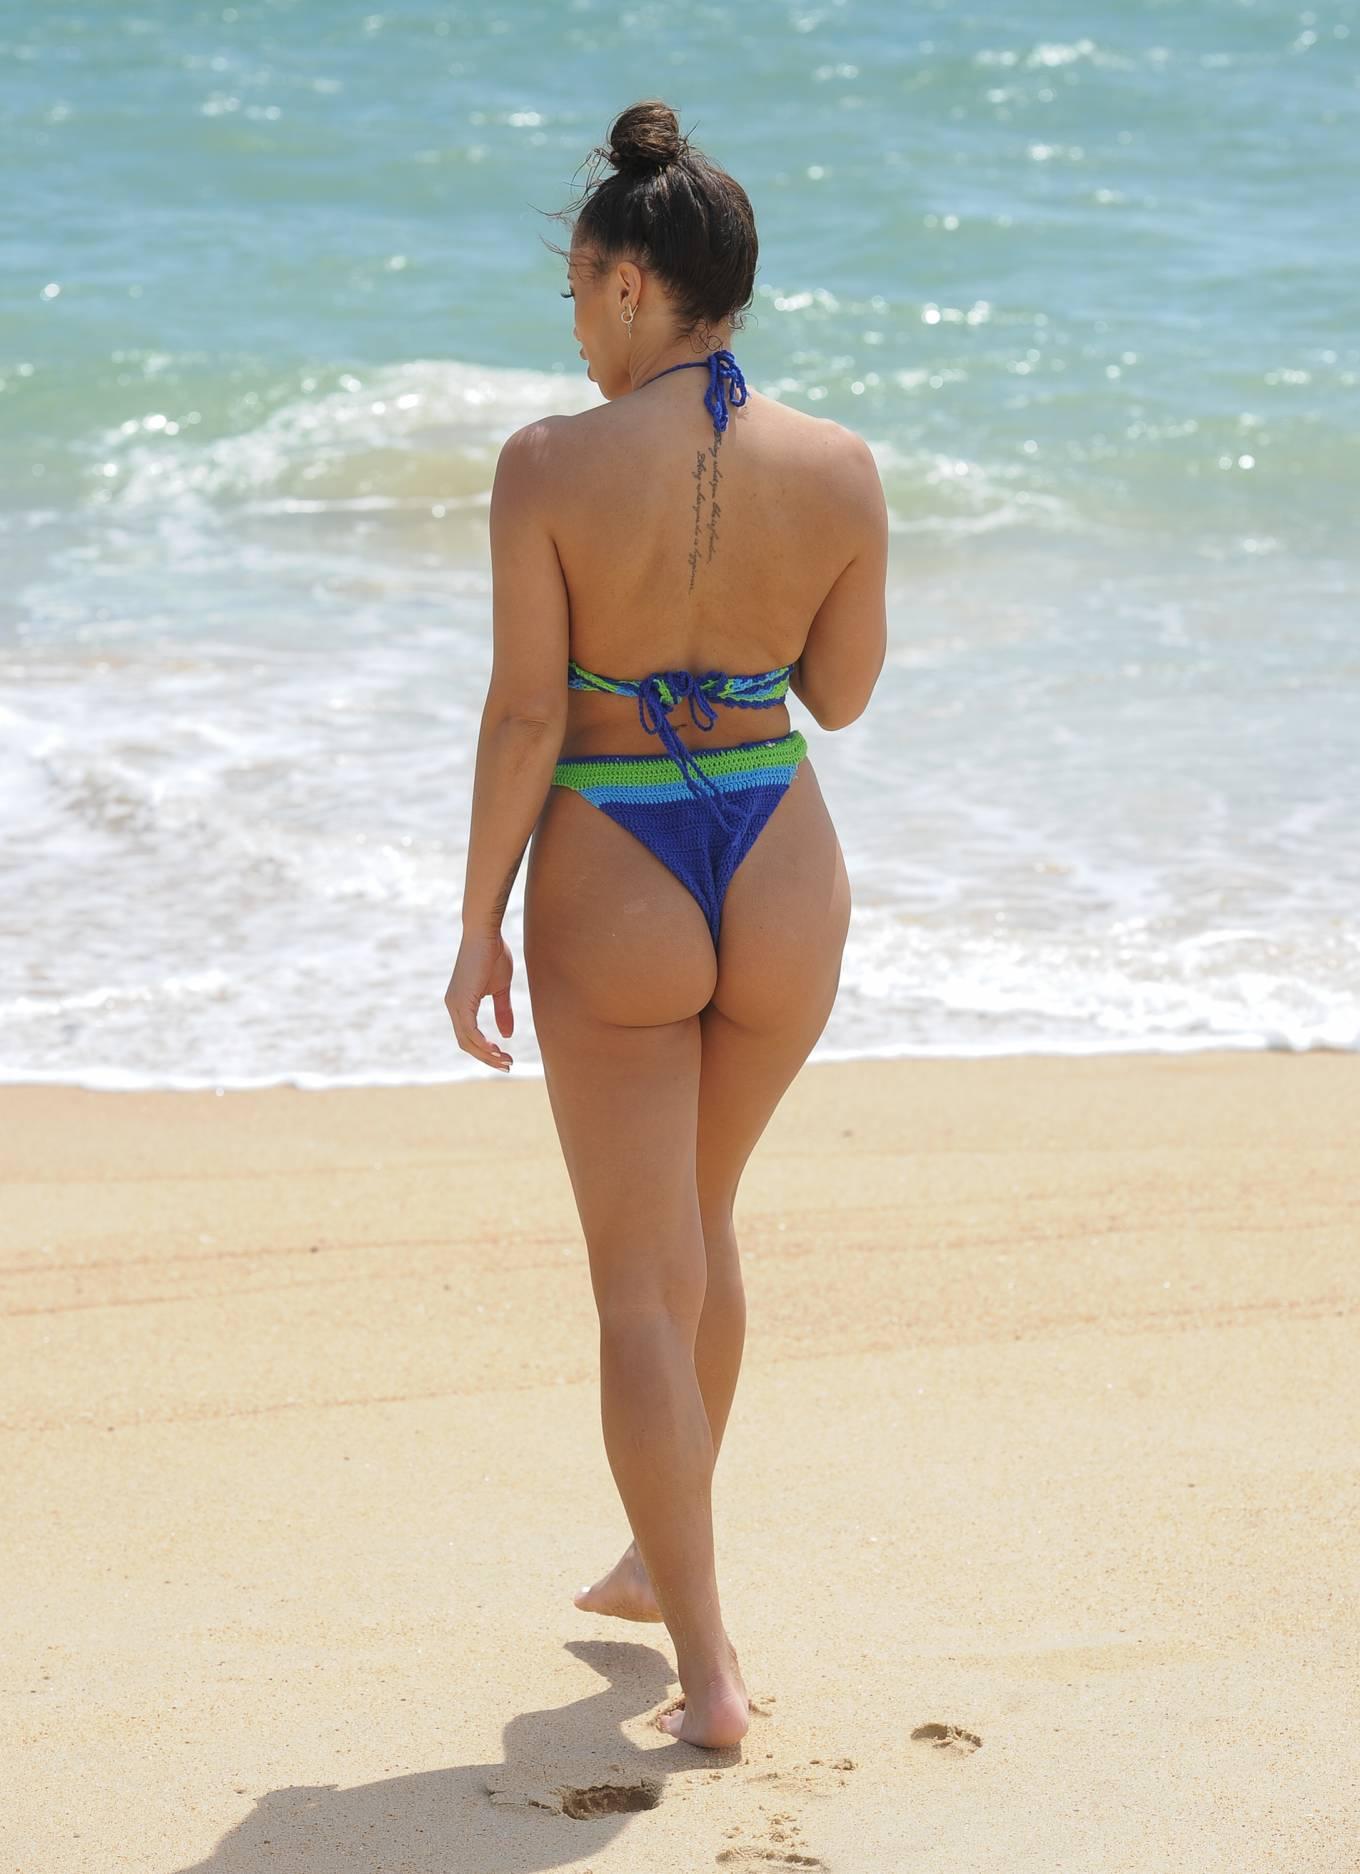 Kayleigh Morris 2020 : Kayleigh Morris in Bikini 2020-06